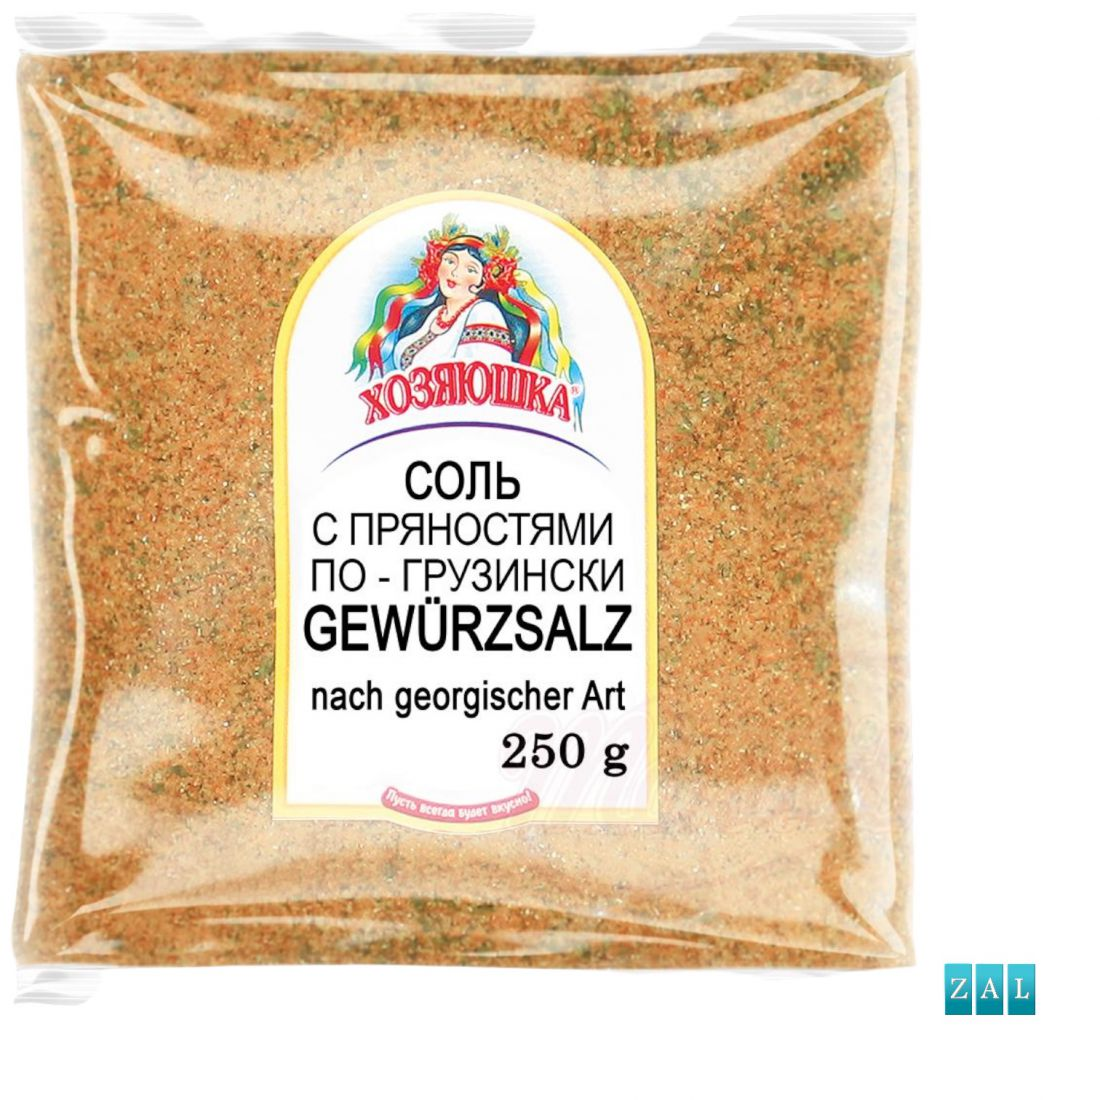 Grúz stílusú fűszeres só 250g